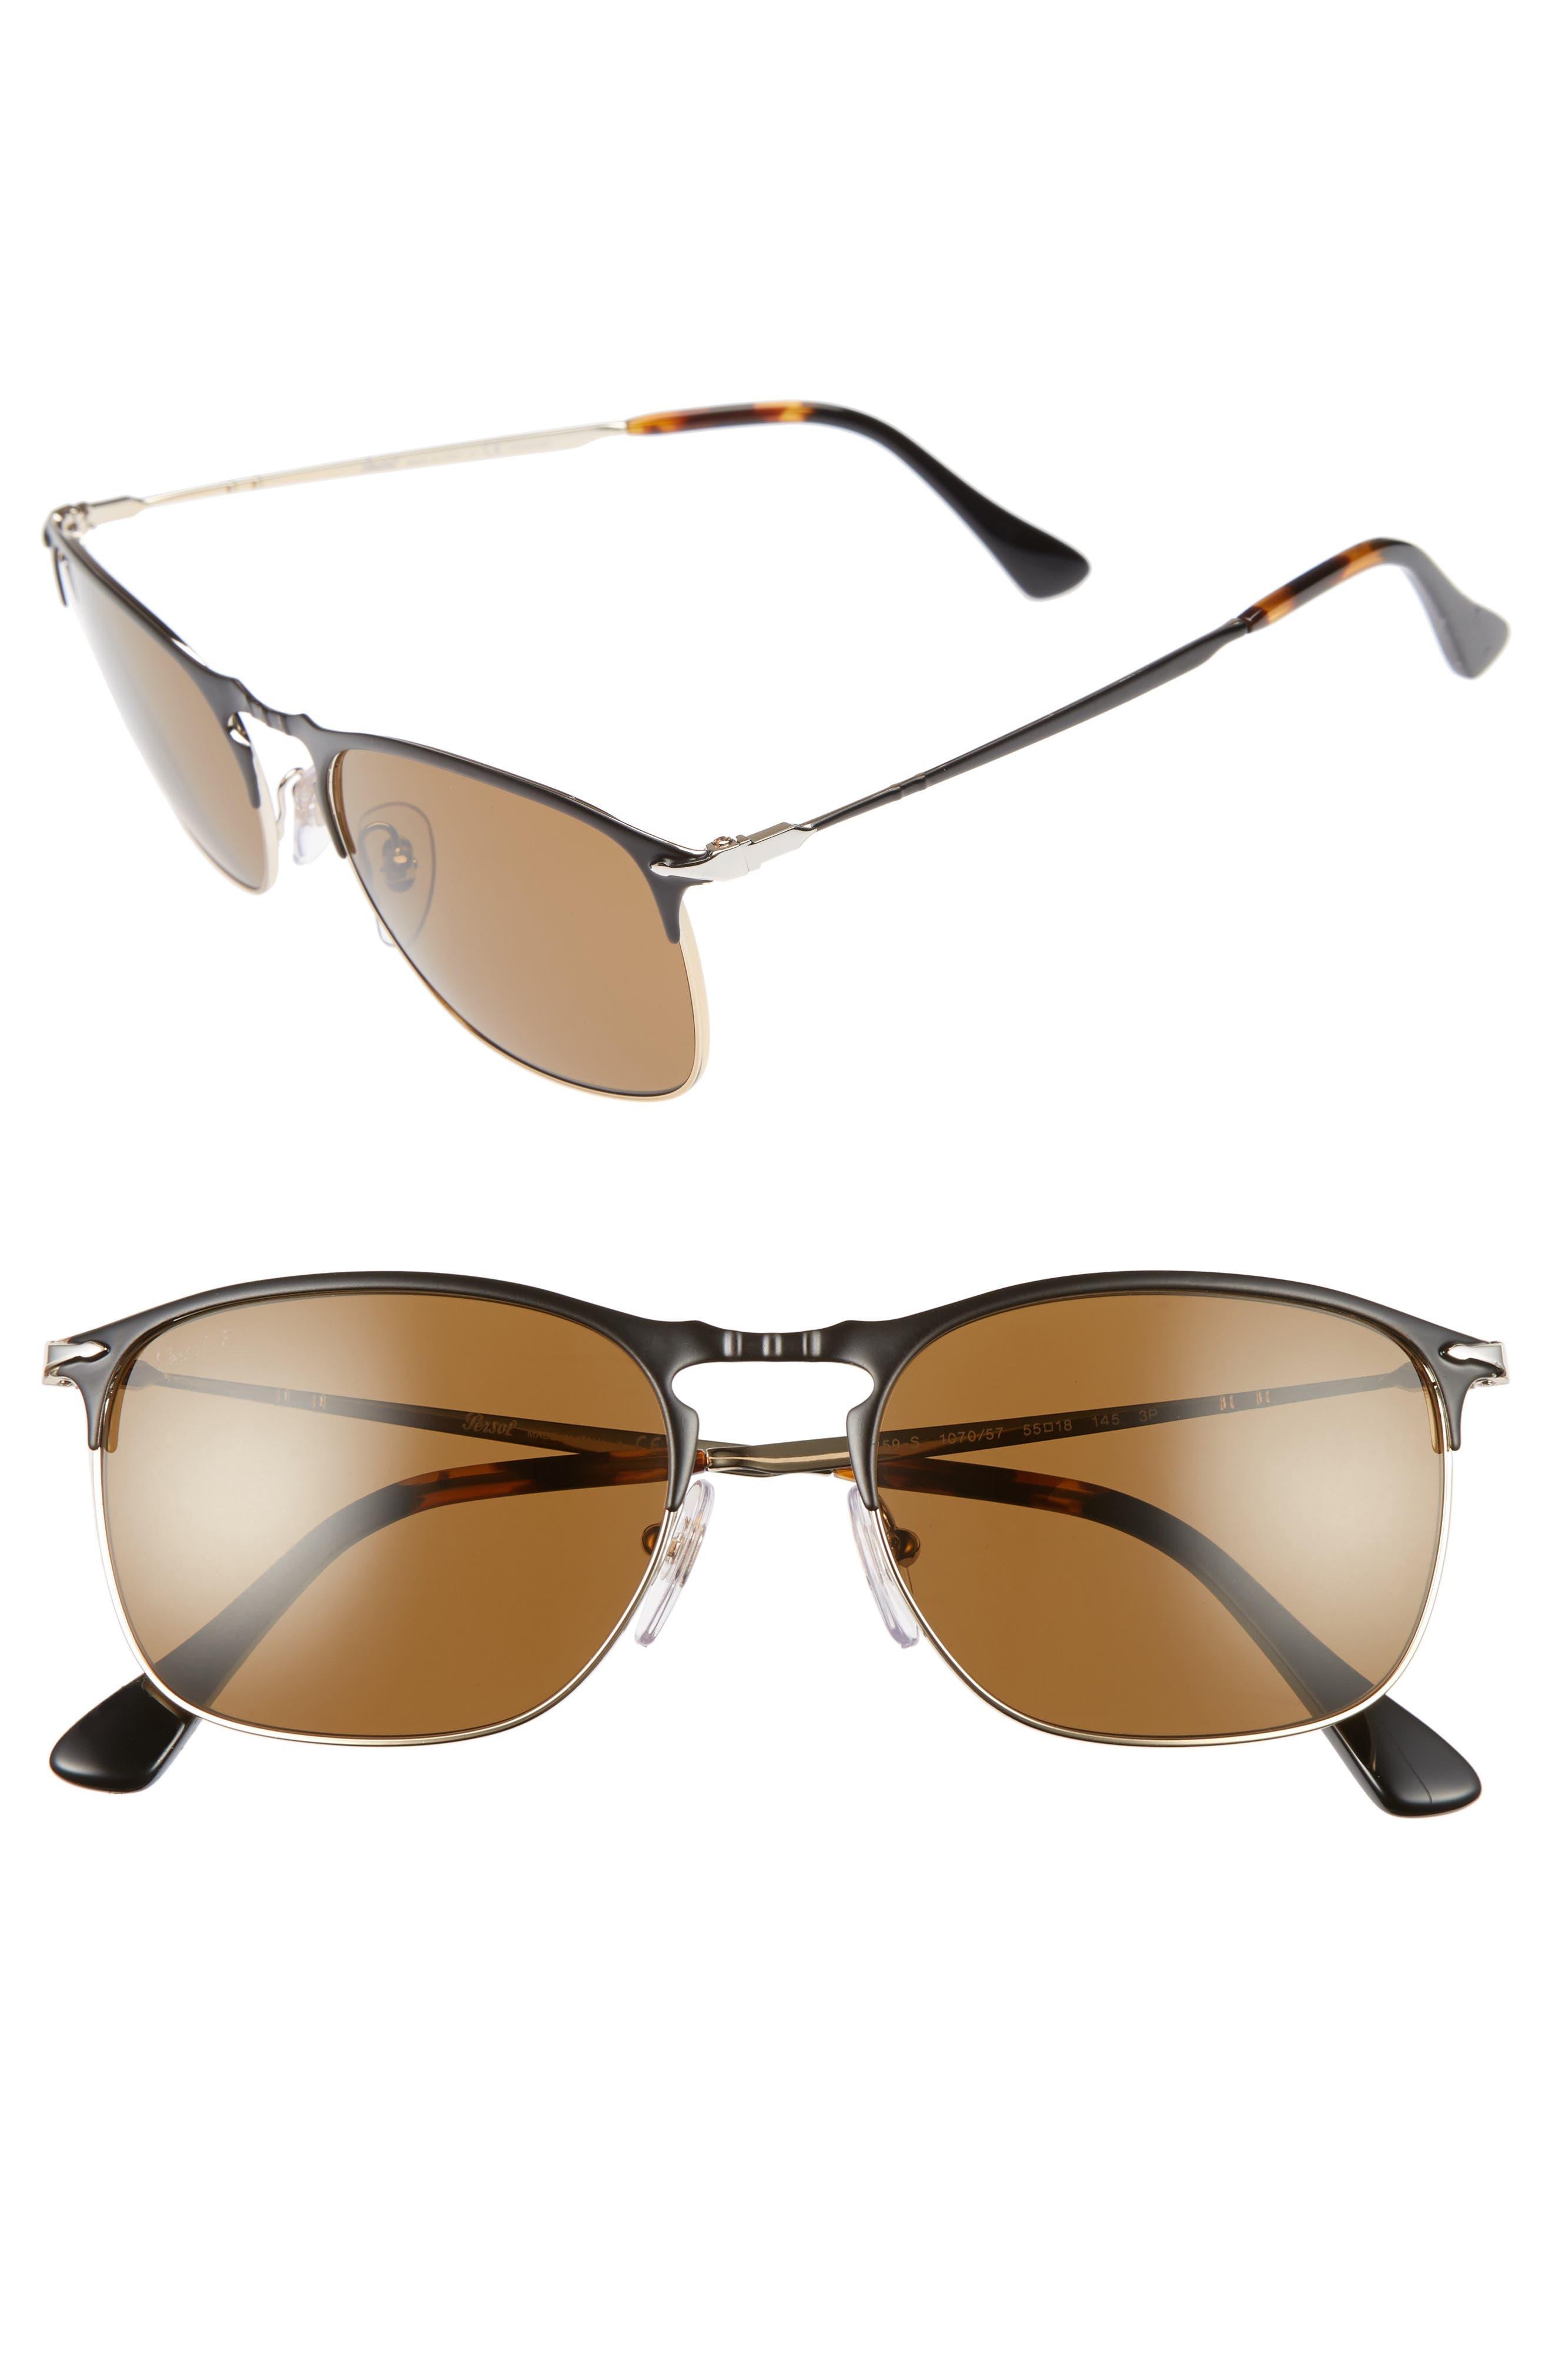 Evolution 55mm Polarized Aviator Sunglasses,                             Main thumbnail 1, color,                             MATTE BLACK